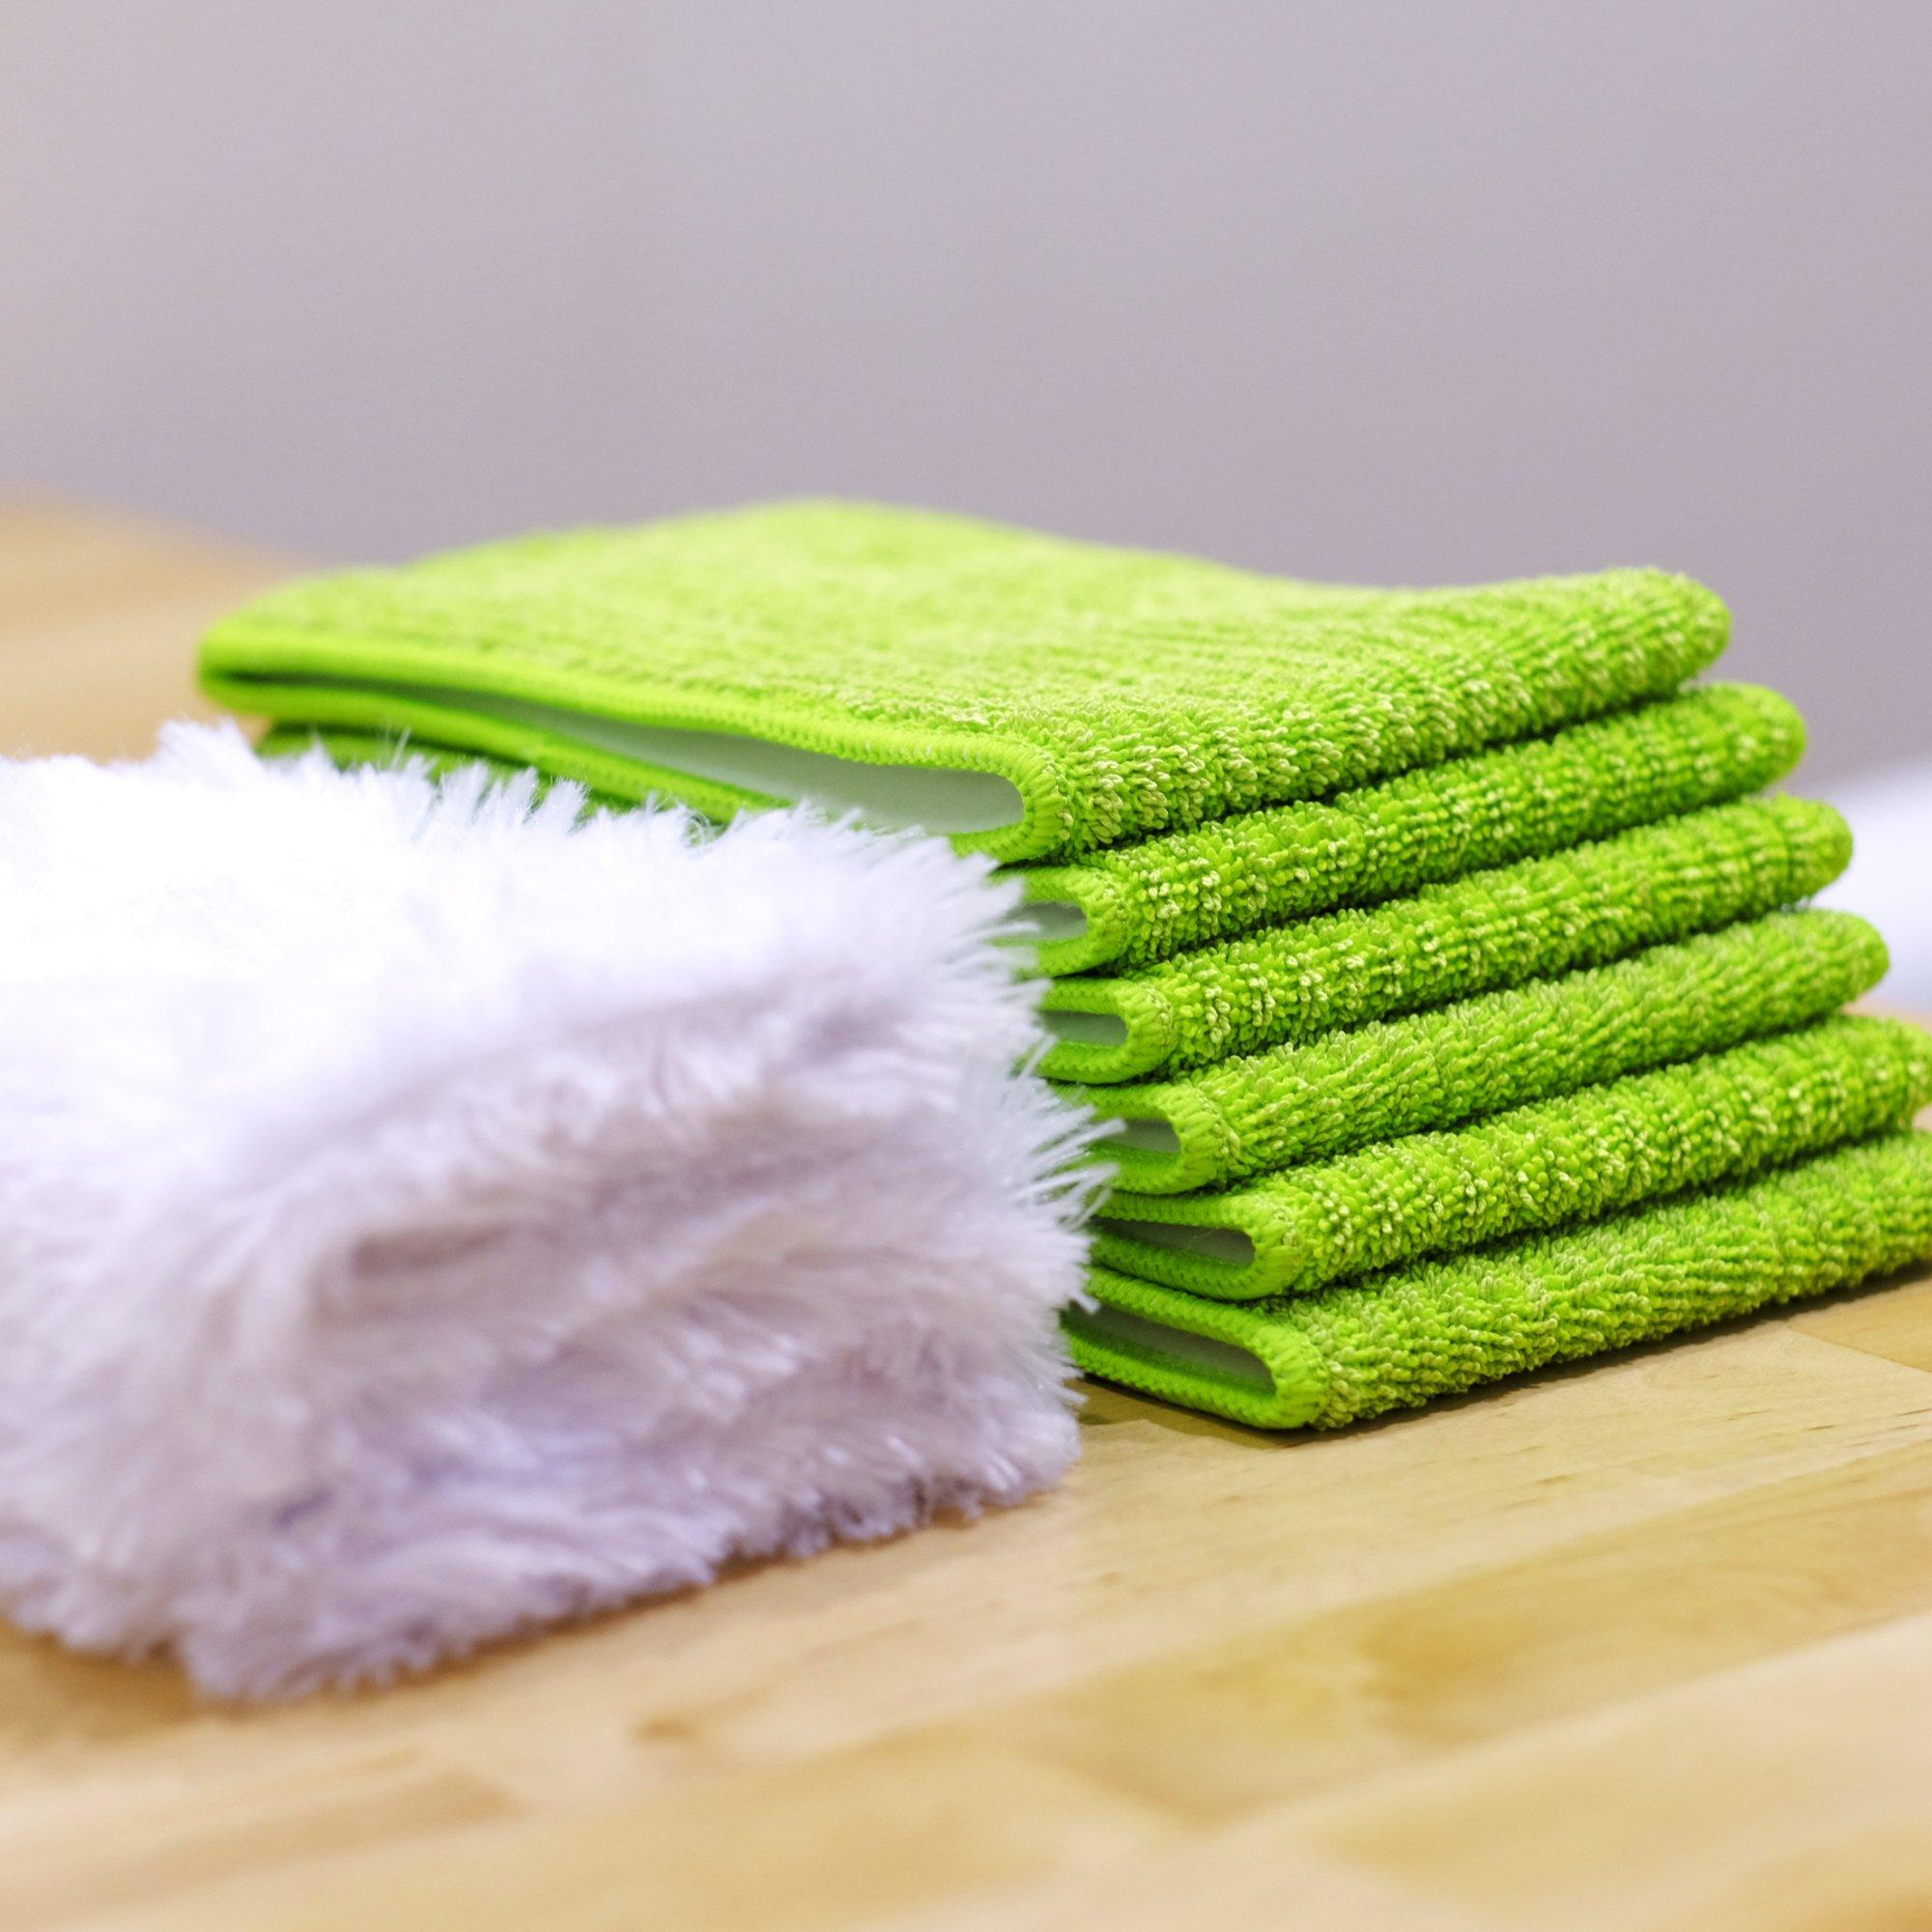 Microfiber Mop 18inch Velcro Wet & Dry Mop Refill for Hardwood Floors Set of 8 by Bear Family by Bear Family Microfiber (Image #4)